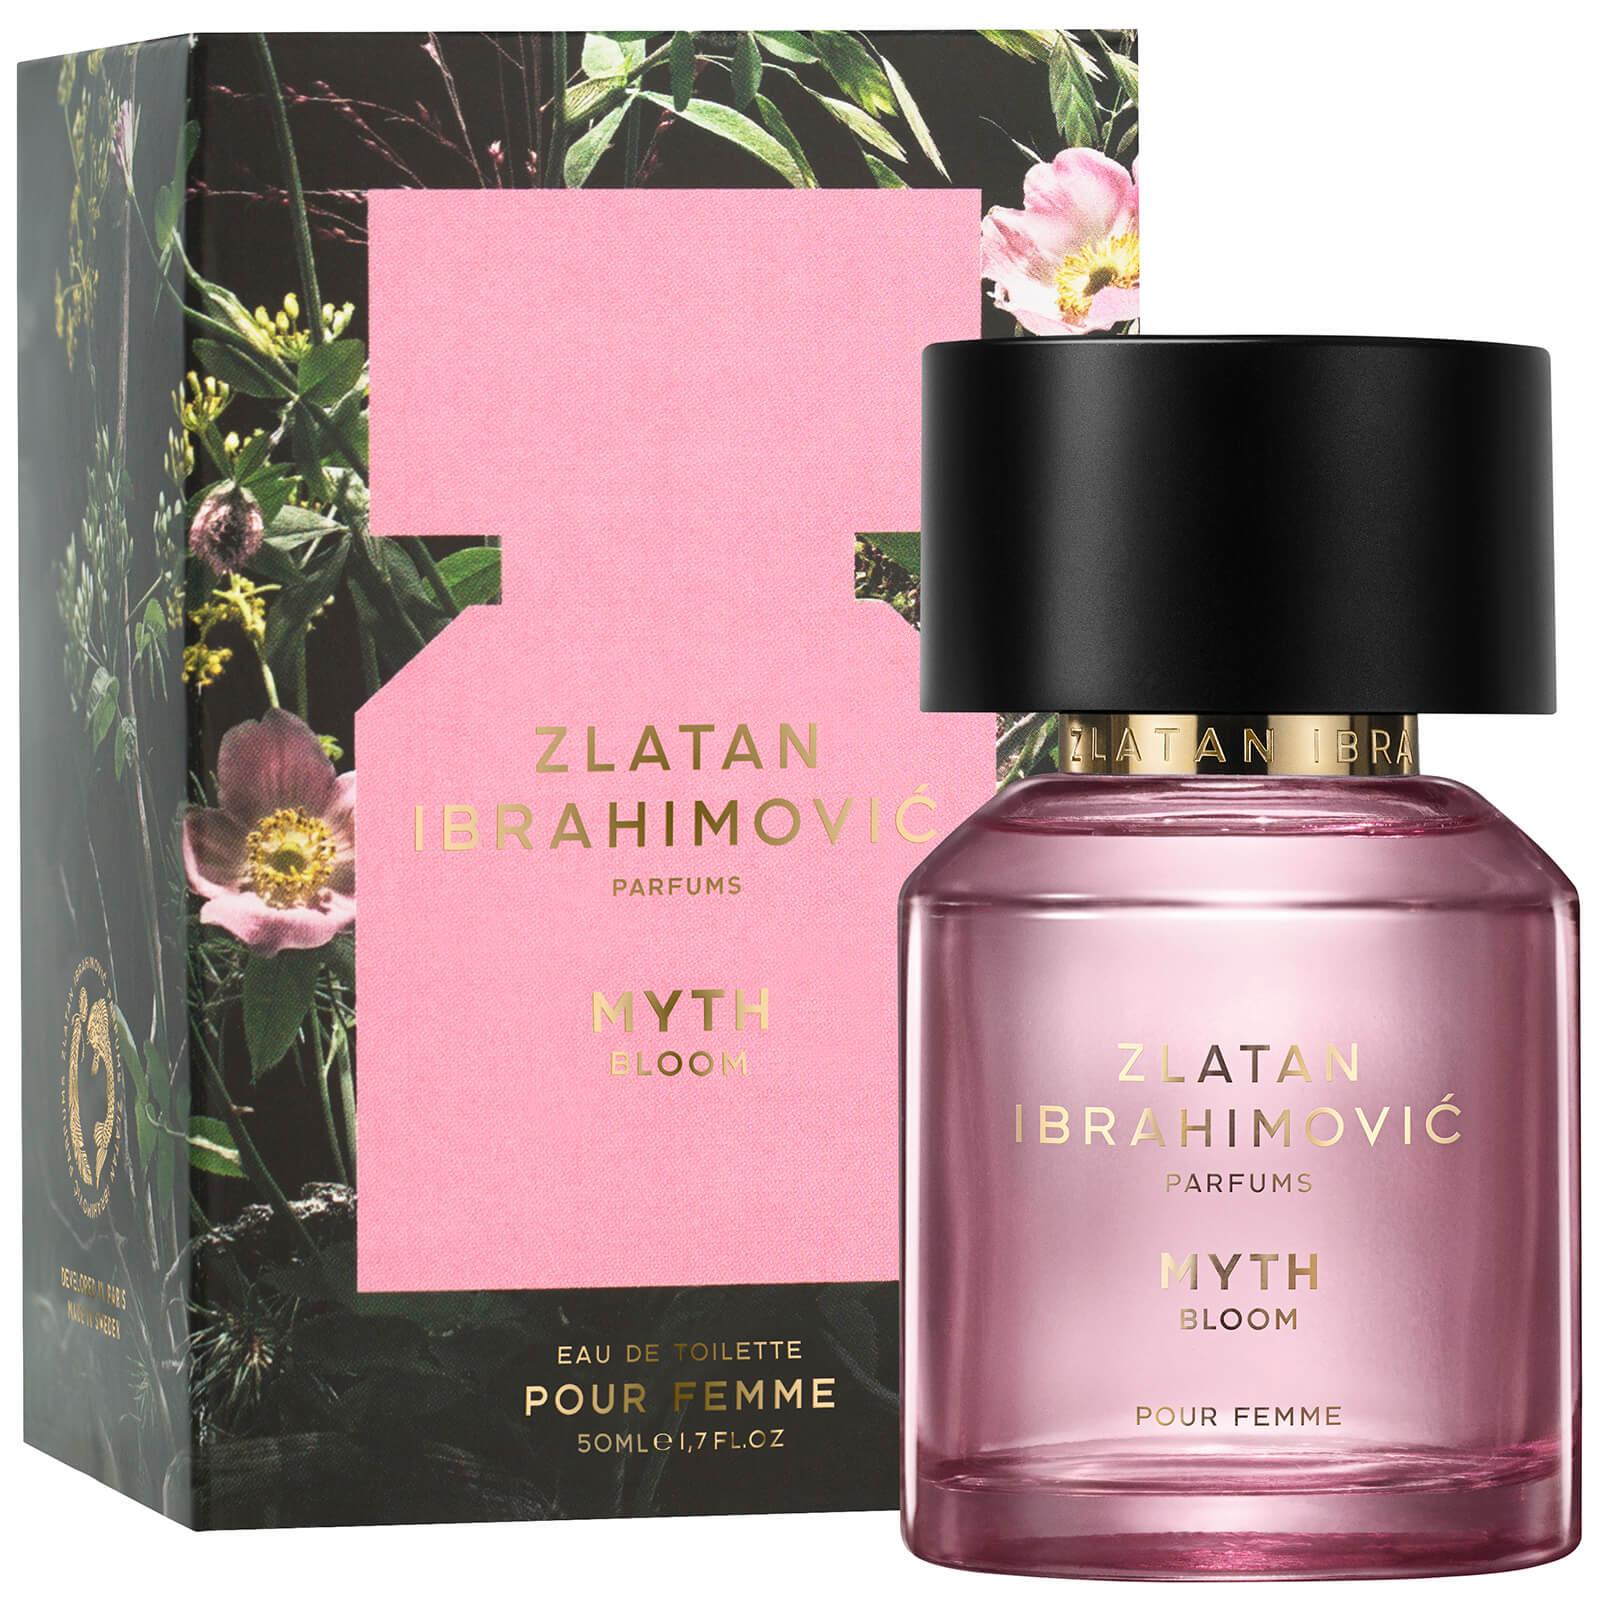 Zlatan ibrahimovic parfums myth bloom femme eau de toilette 50ml zlatan ibrahimovic parfums myth bloom femme eau de toilette 50ml izmirmasajfo